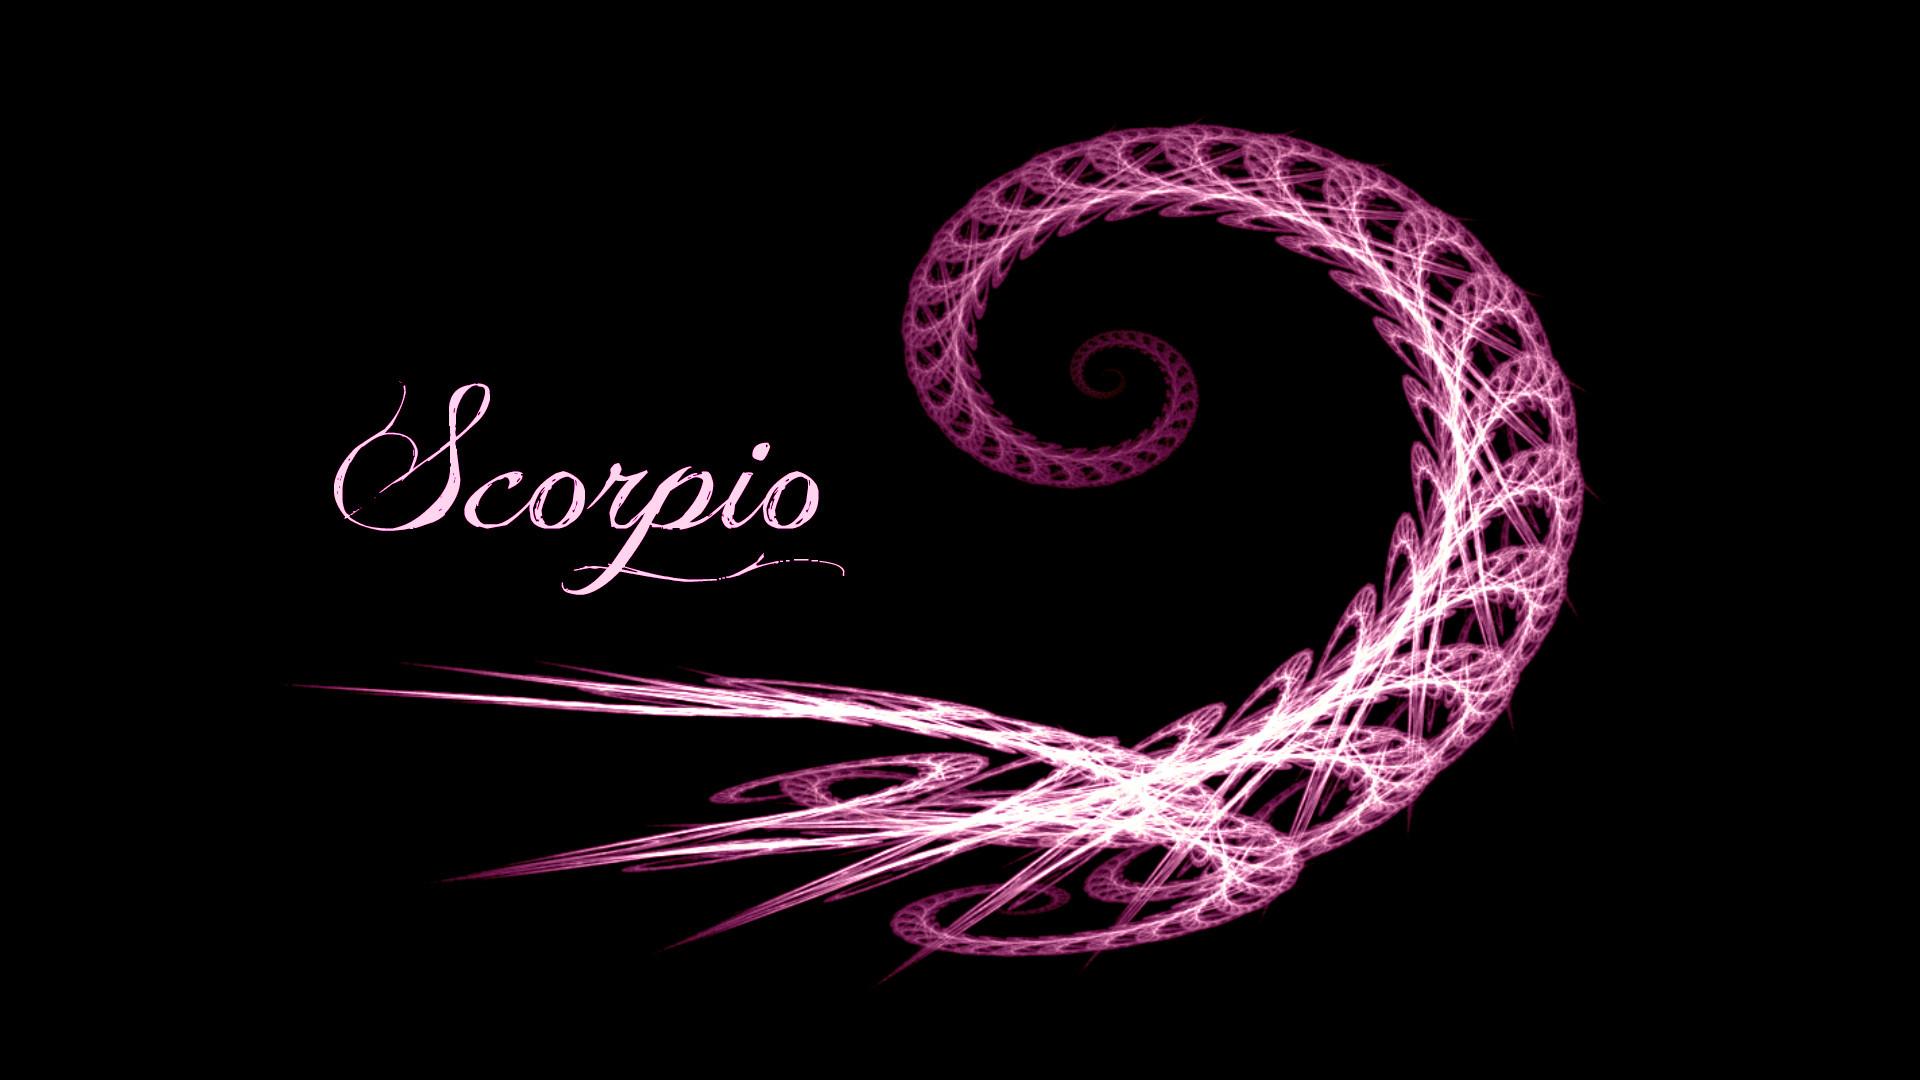 Scorpion Wallpaper Iphone